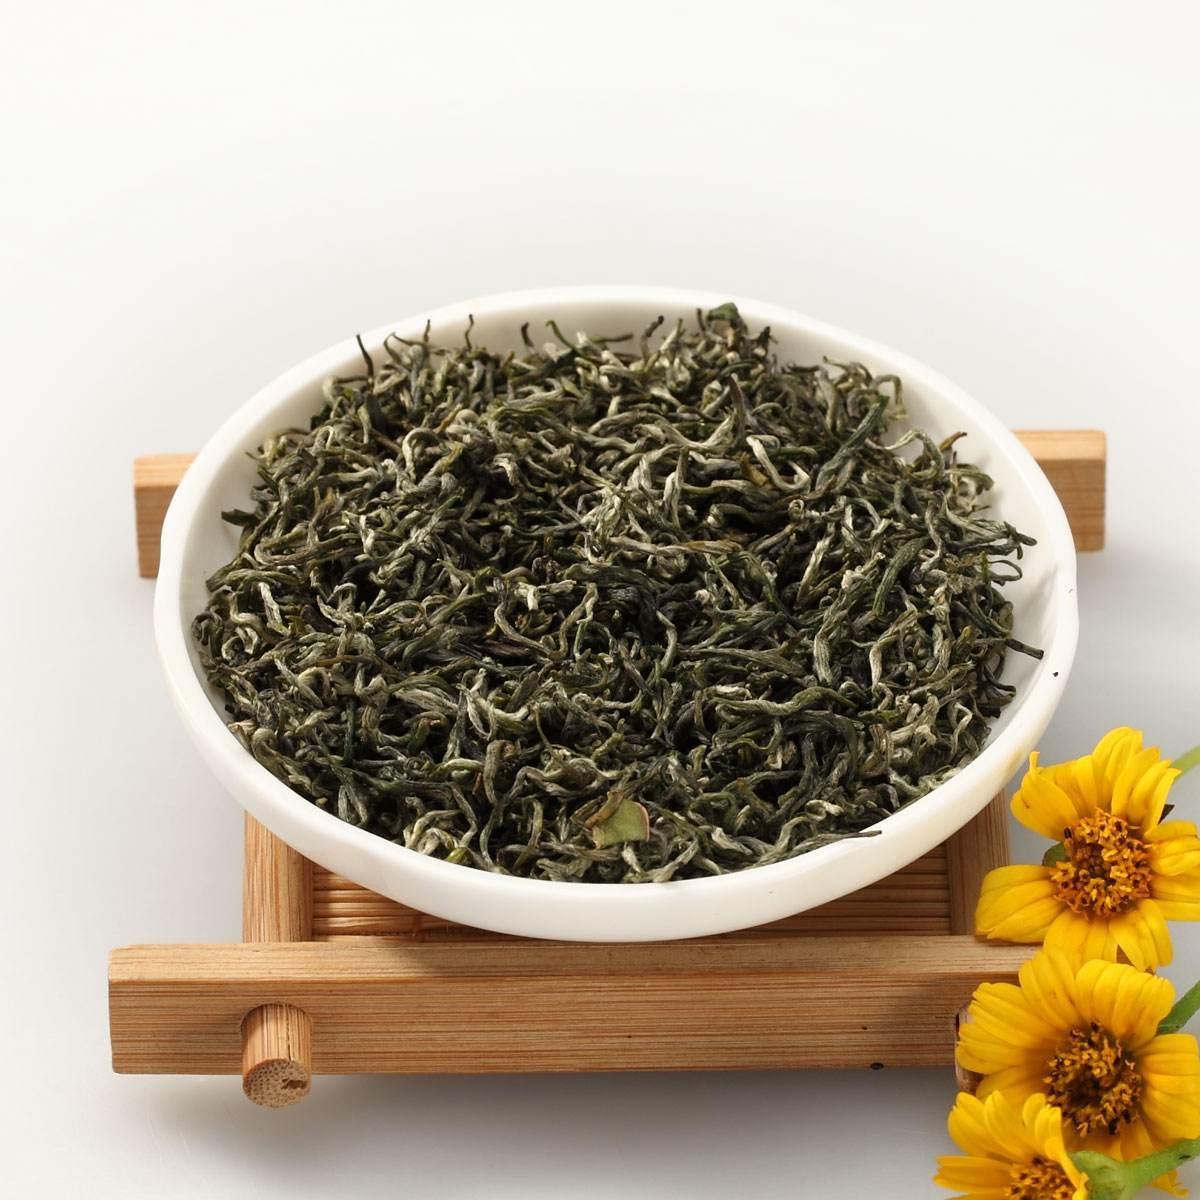 Tea Chazhidao Chinese Tea Traditions School